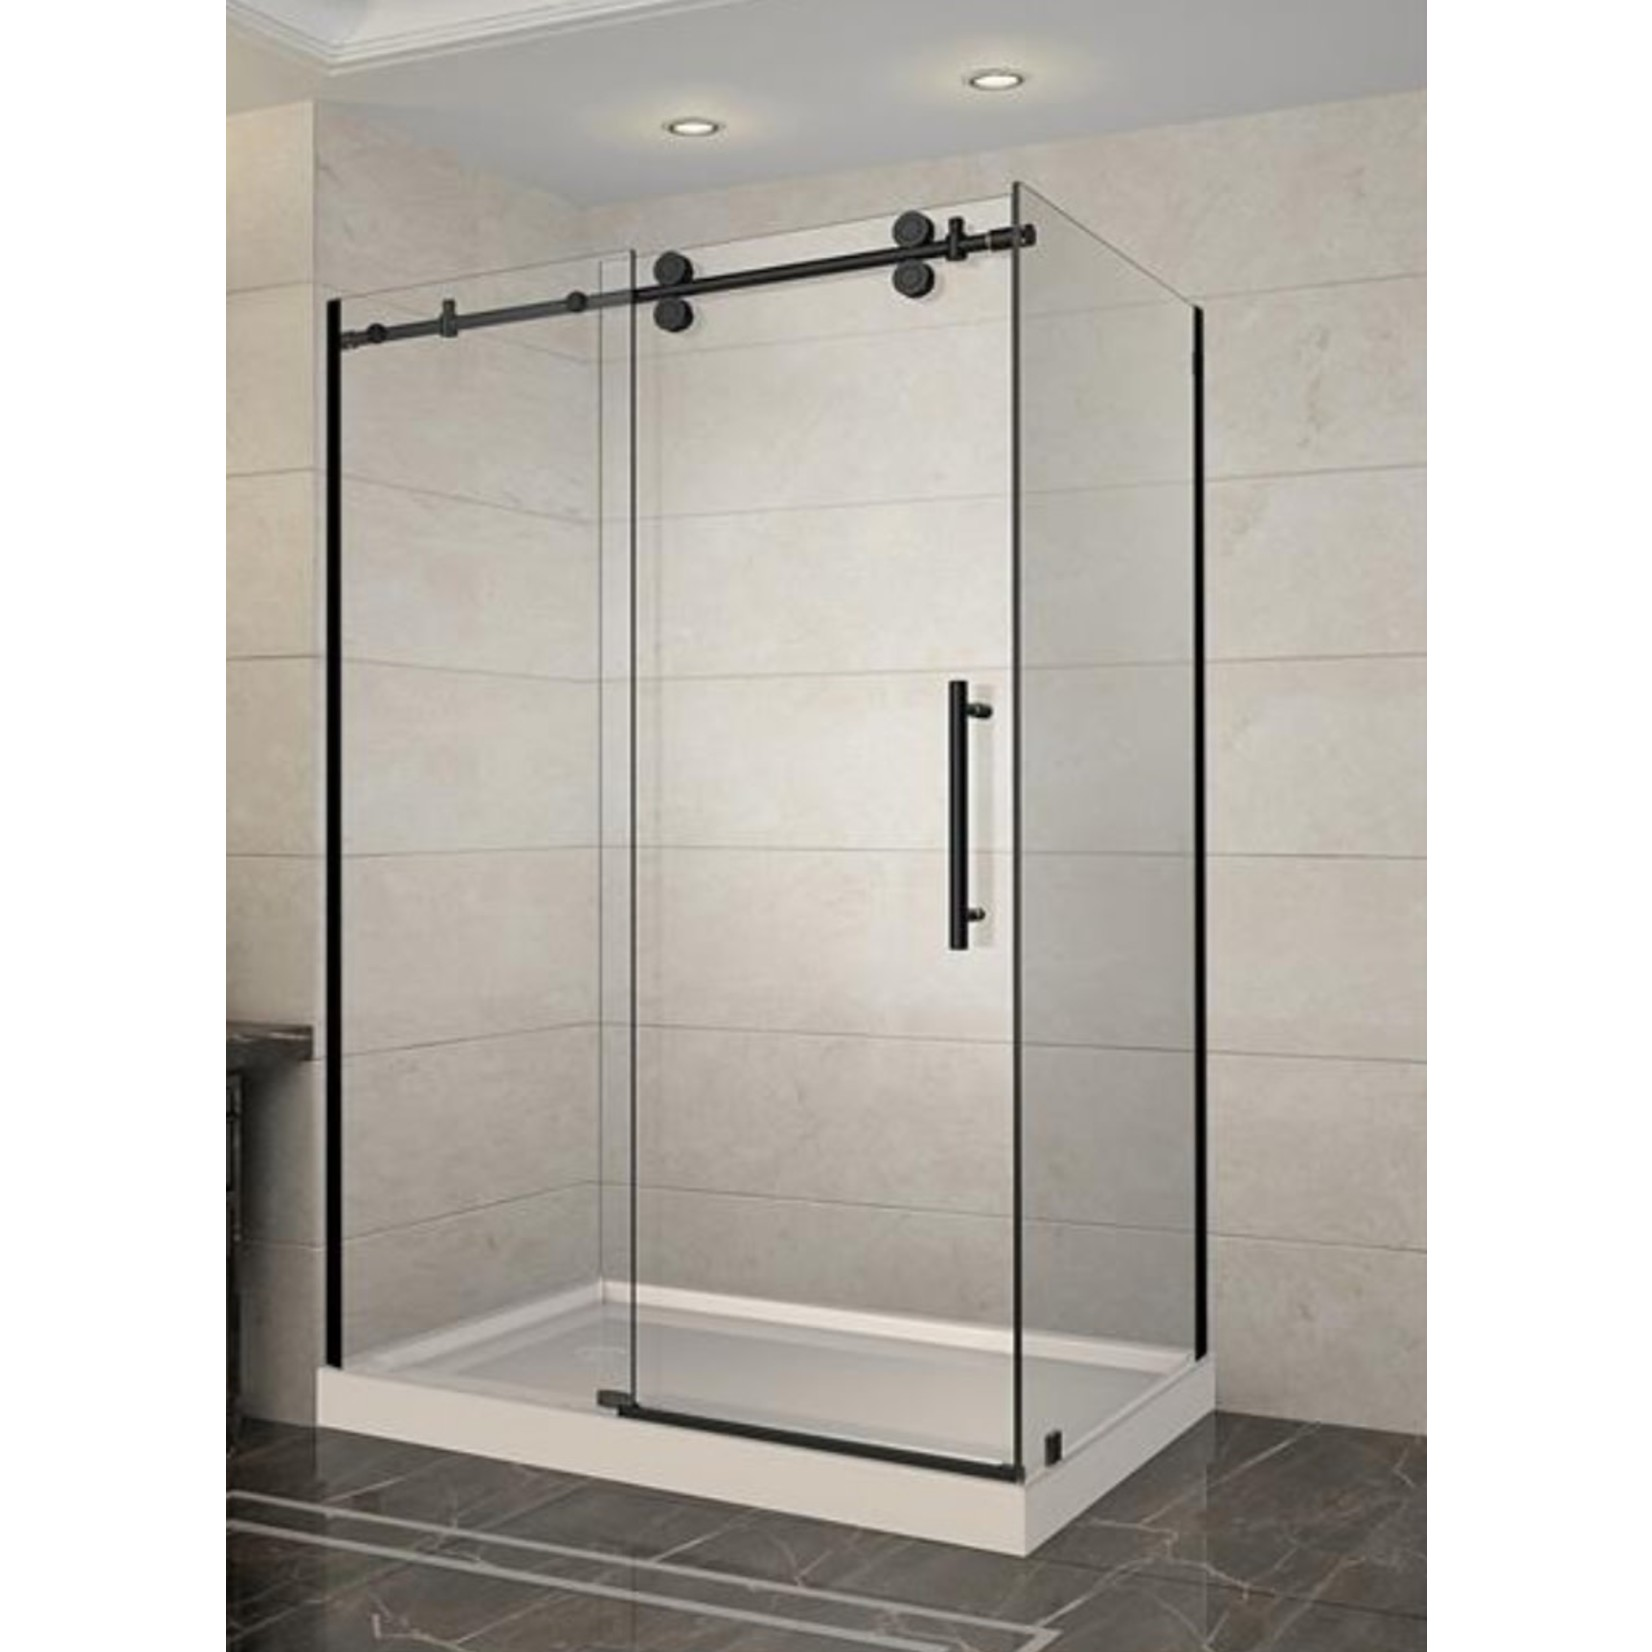 Luhö  Reversible shower set 36x60 matt black Zirkon Luho series